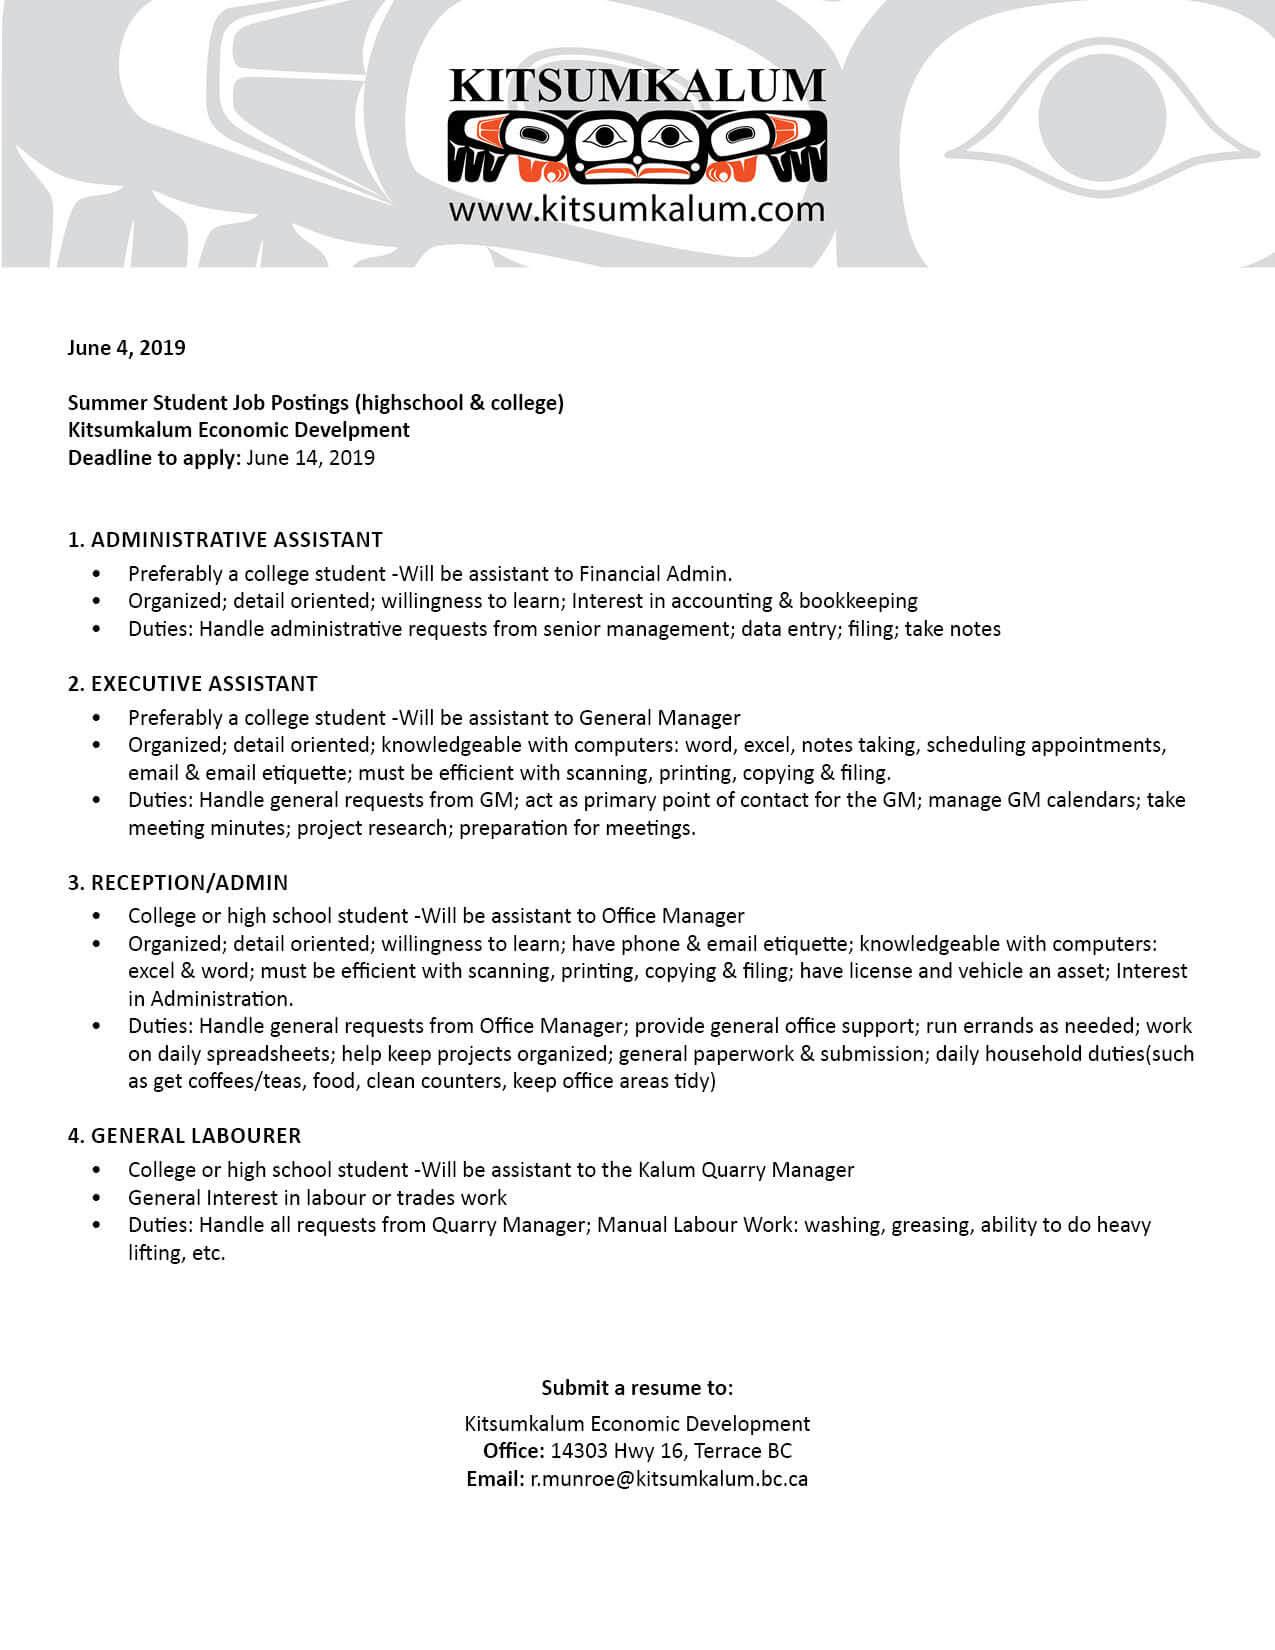 Summer Student Job Opportunities with Kitsumkalum Ec Dev